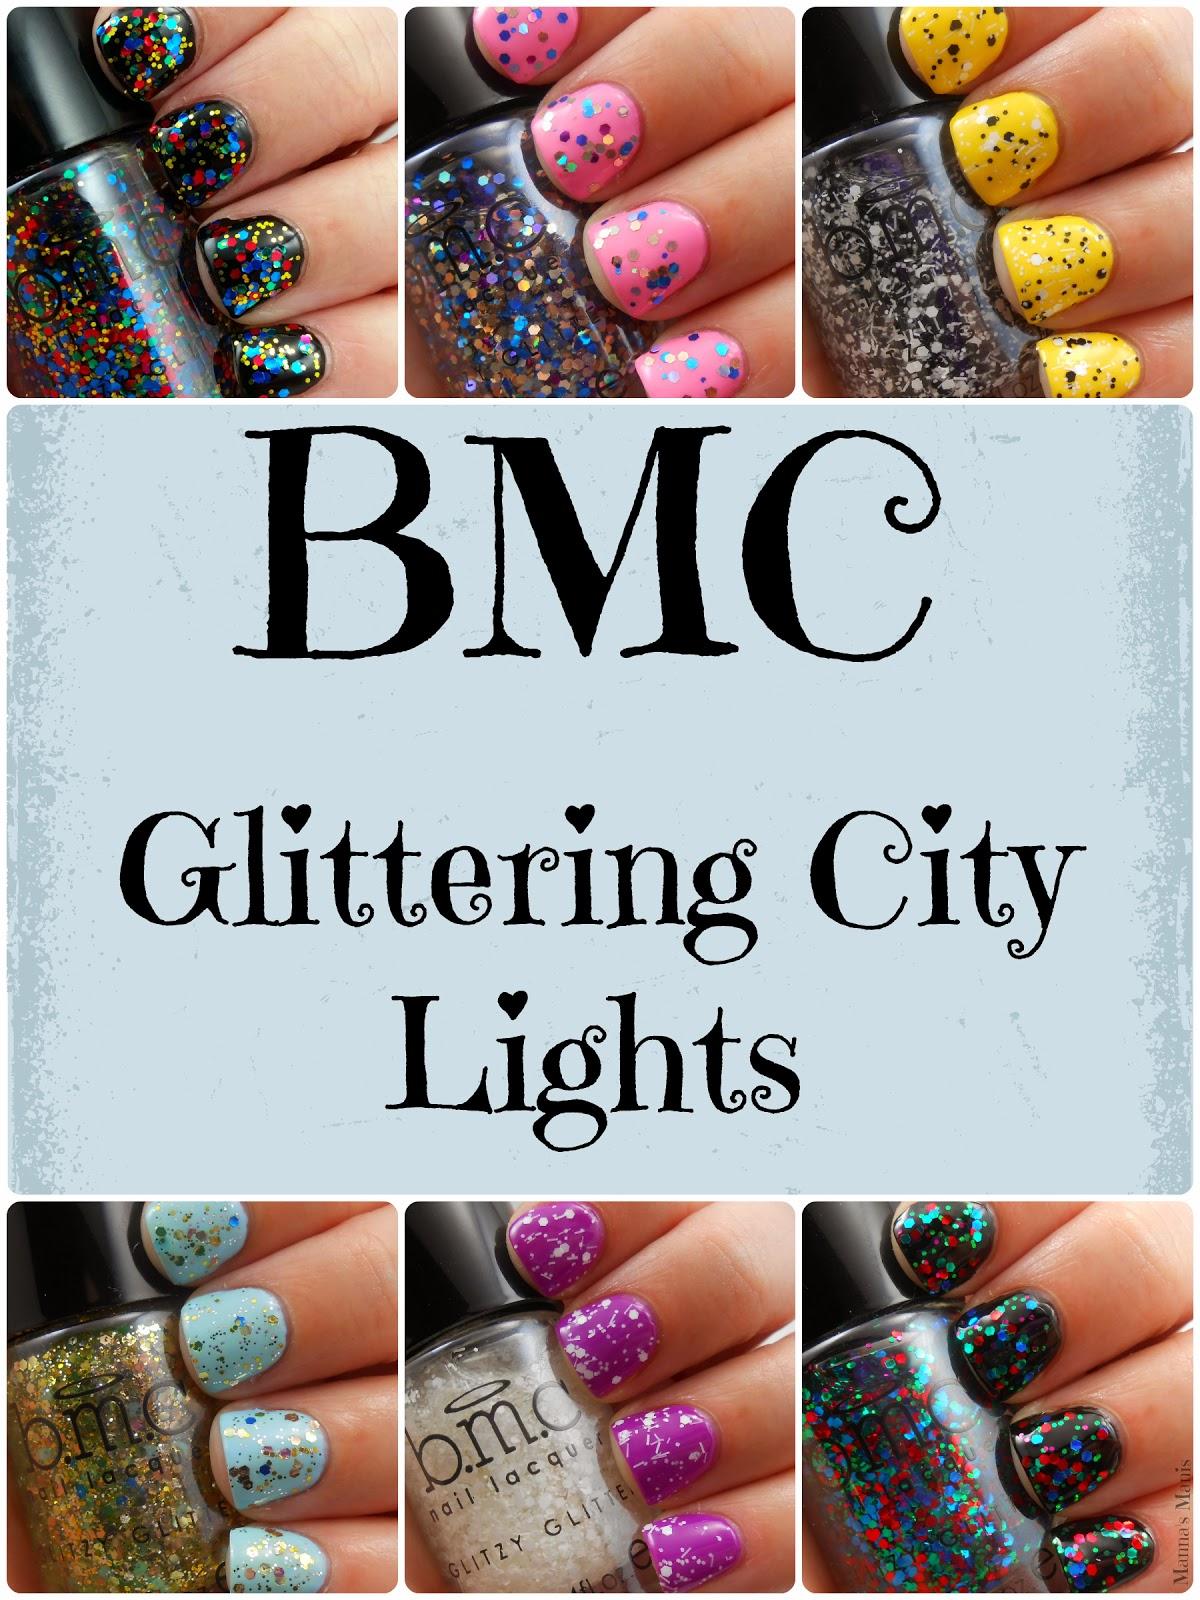 BMC Glitter City Lights nail polish collection